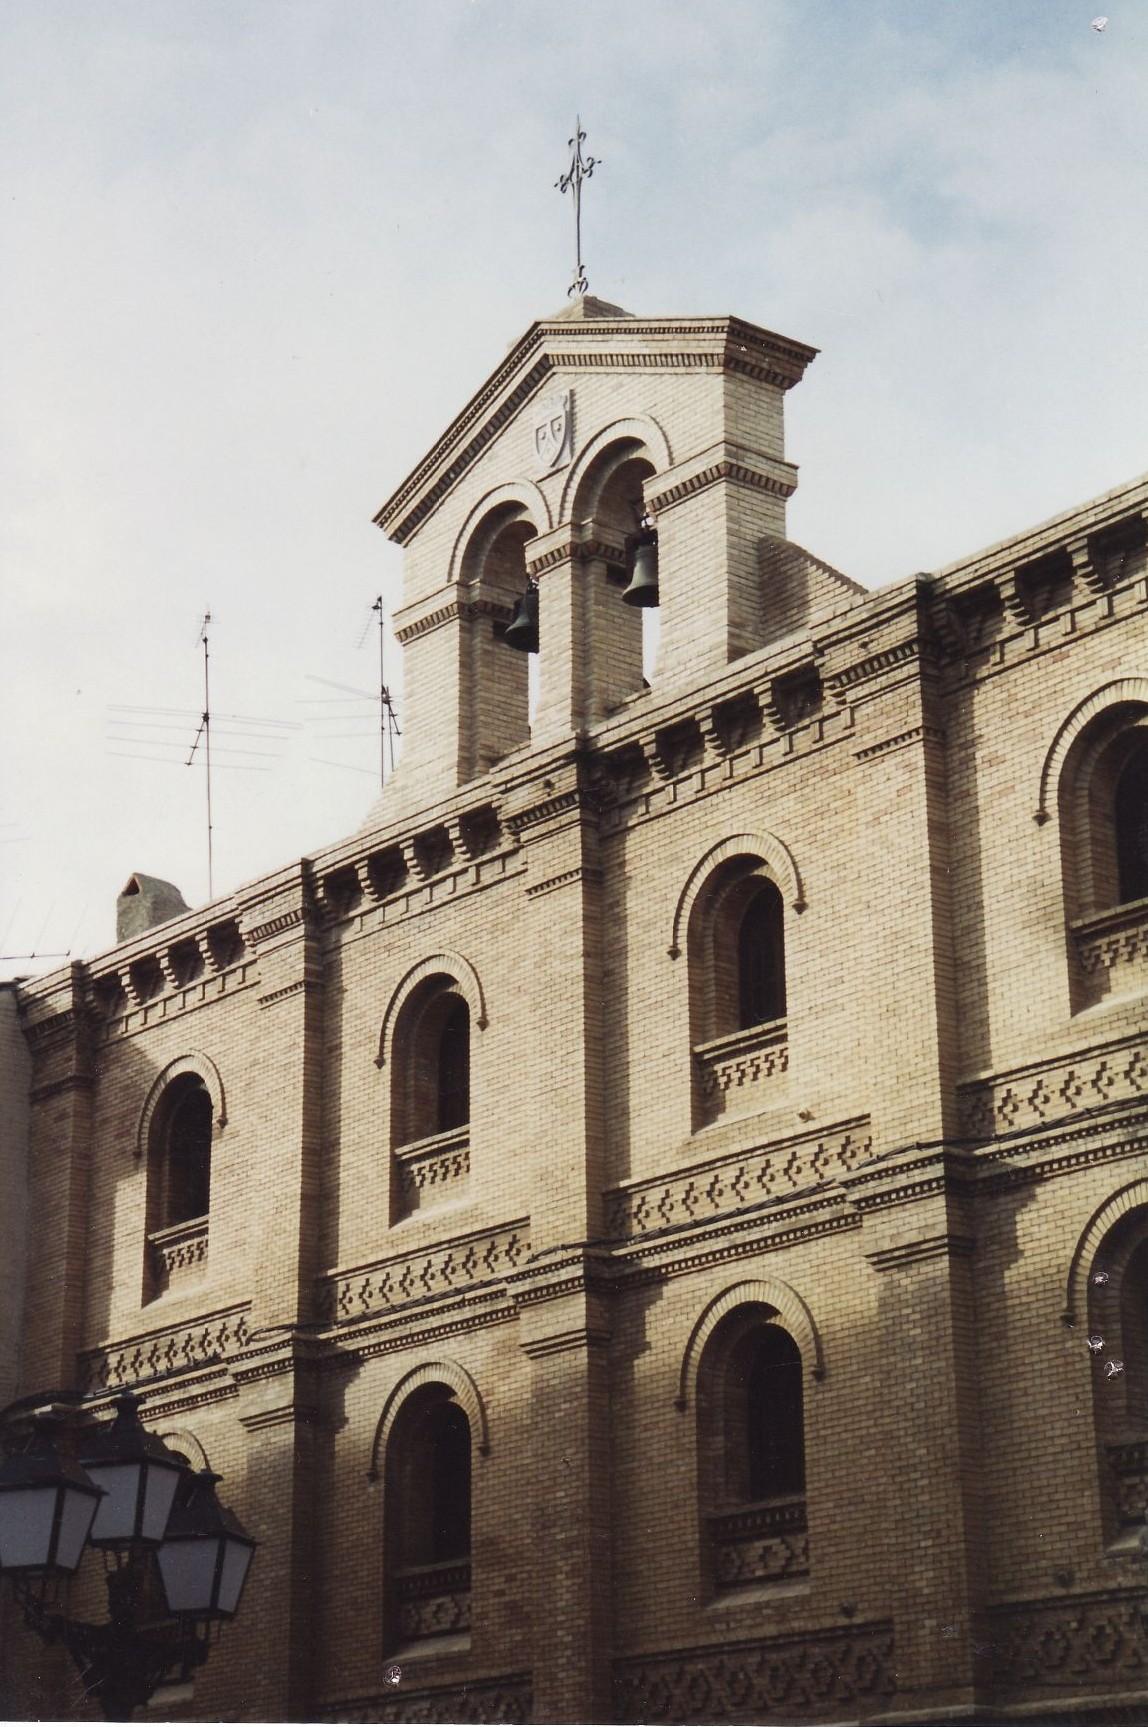 CONVENTO DE NTRA:SRA:DE LA ASUNCIÓN EN HUESCA (CARMELITAS)